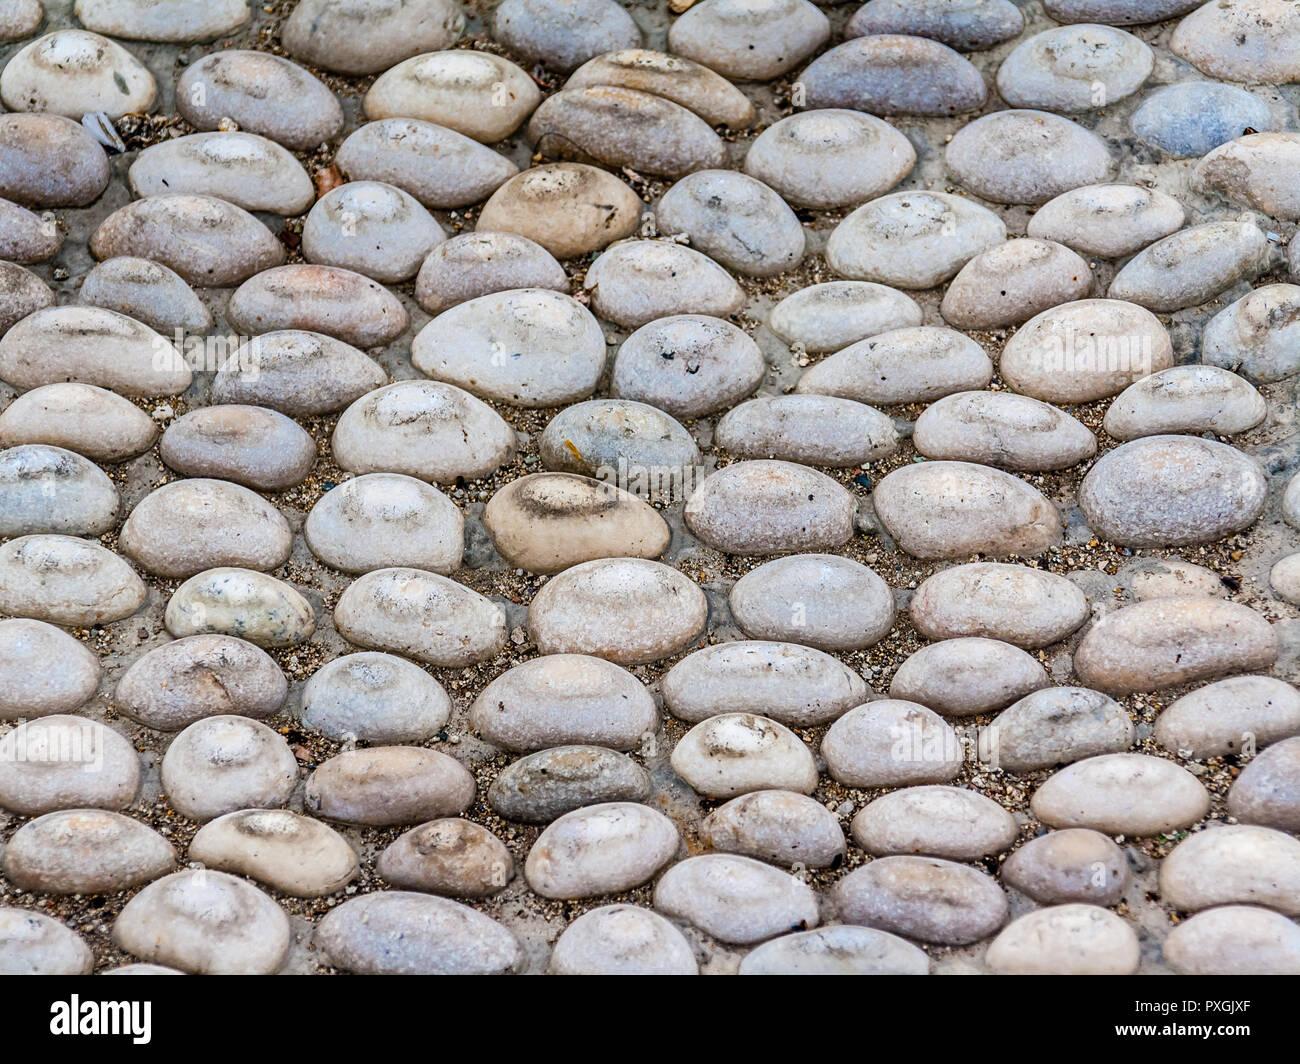 pebble pebbles path pavement stockfotos & pebble pebbles path